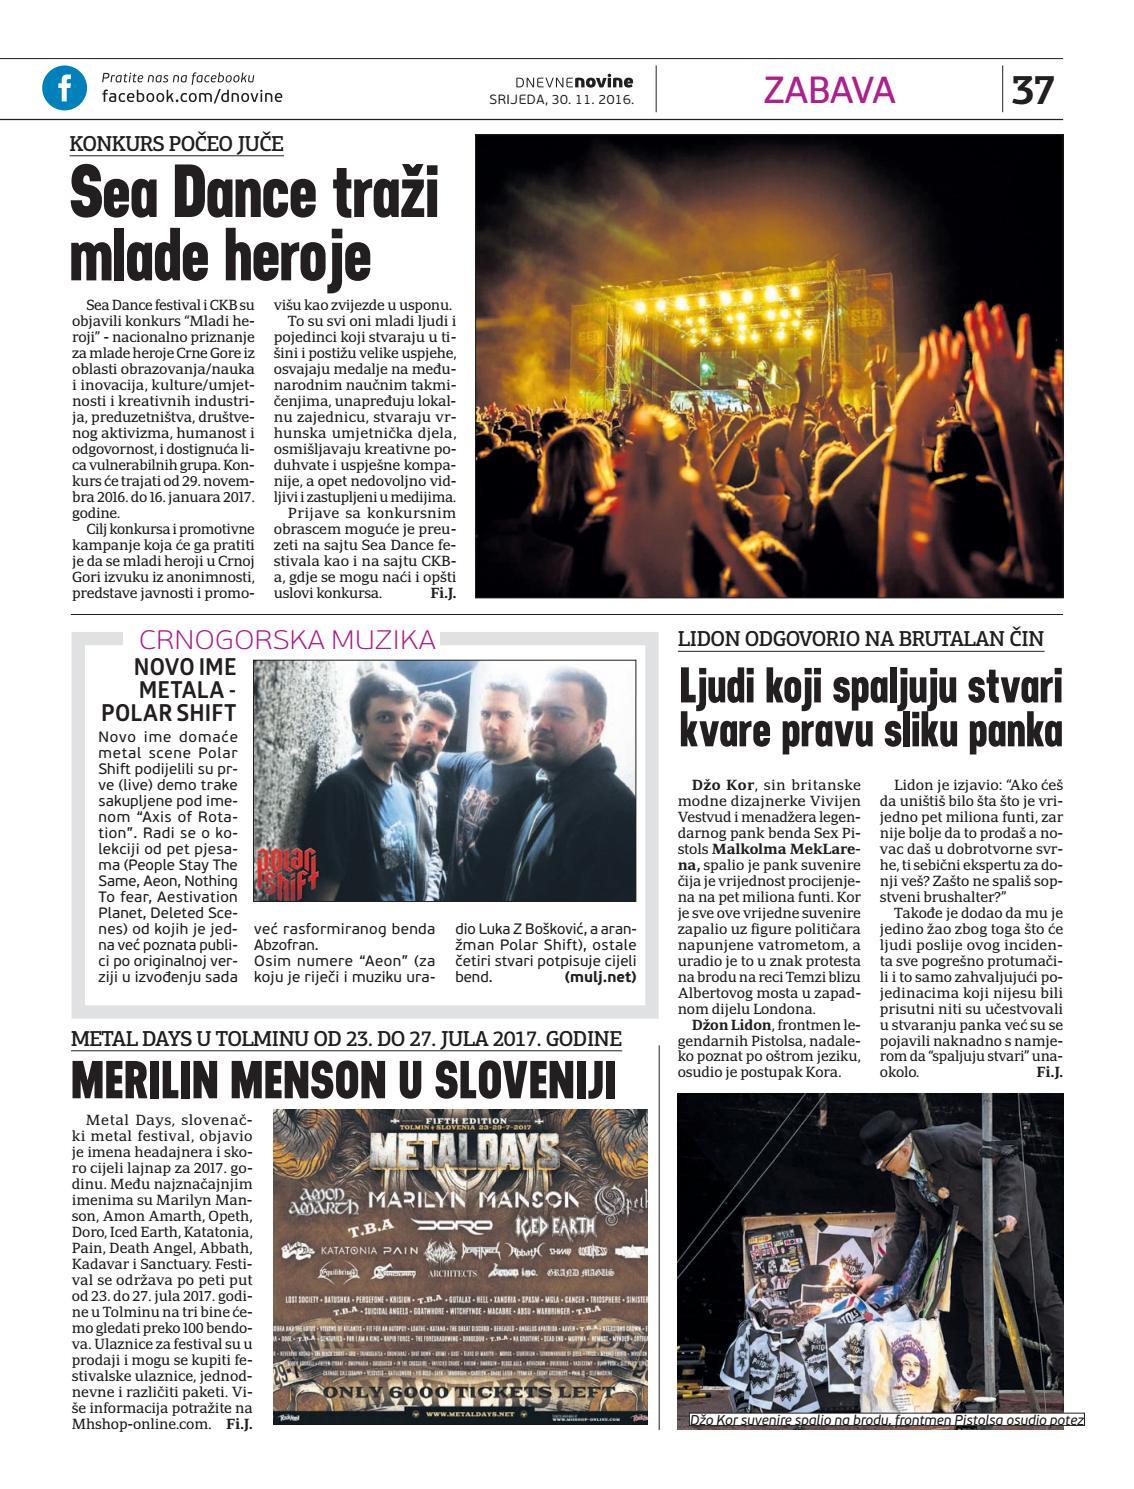 Dnevne novine 30  novembar 2016  by Dnevne Novine - issuu